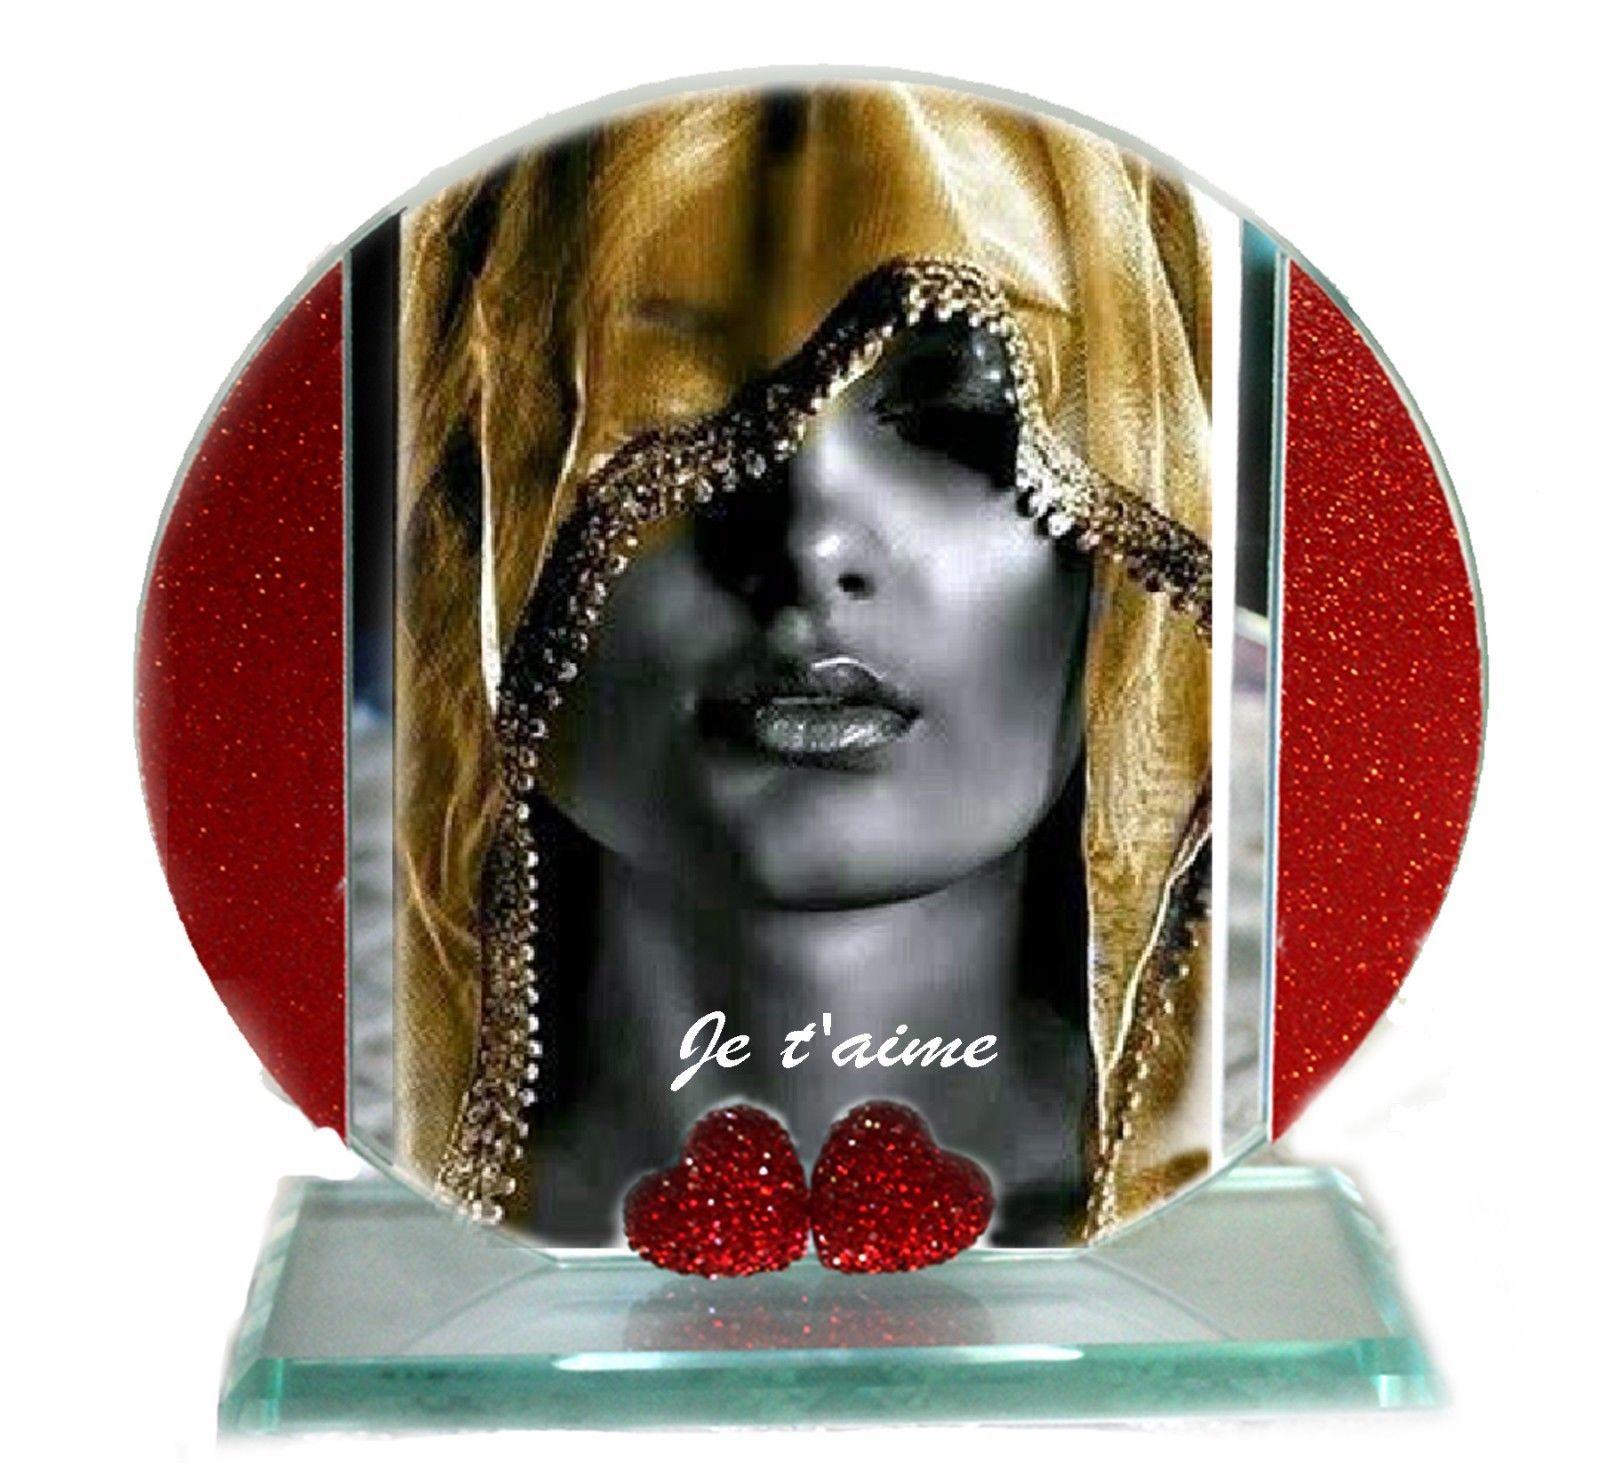 Pure Gold, Je t'aime, Cut Glass Round Plaque, Xmas Edition | Cellini Plaques #1